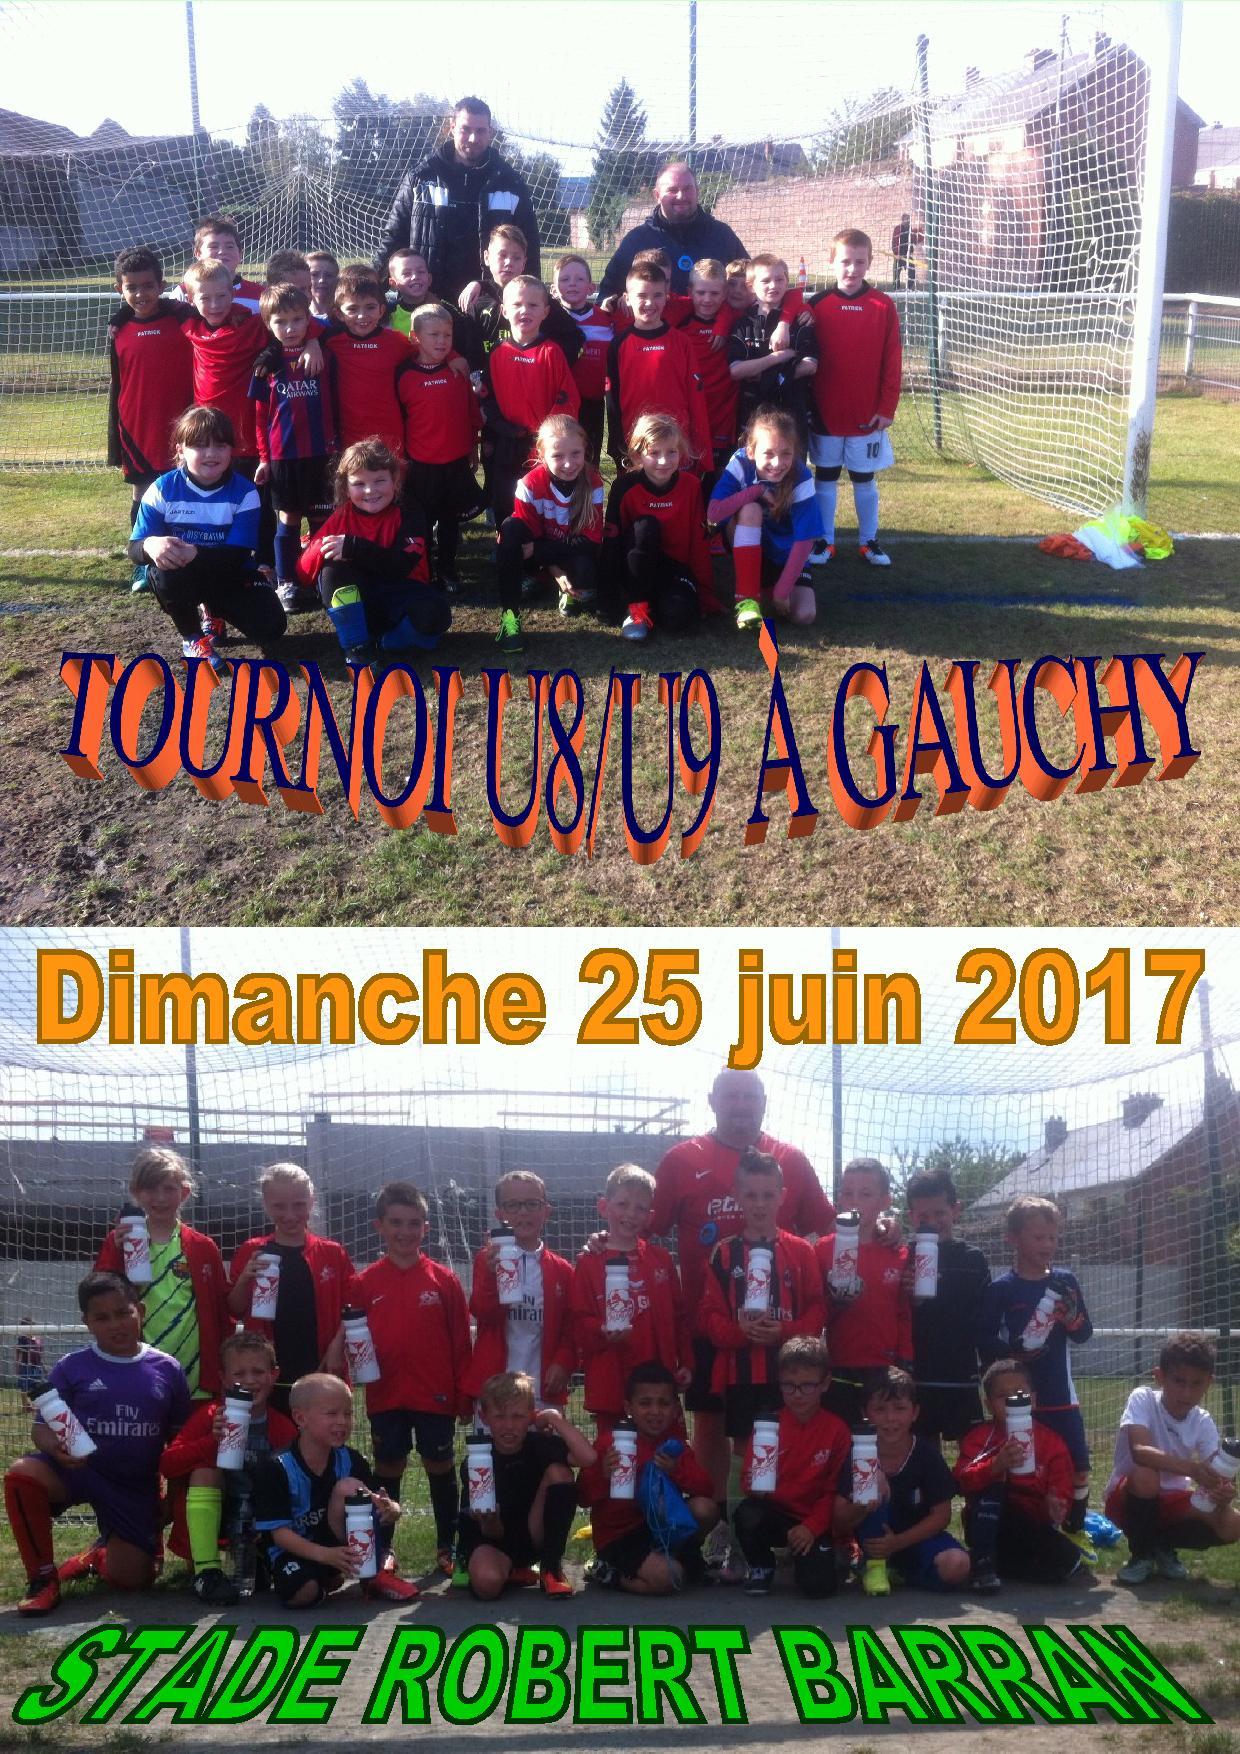 25.06.2017 AFFICHE U8-U9 Tournoi à GAUCHY-page-001.jpg